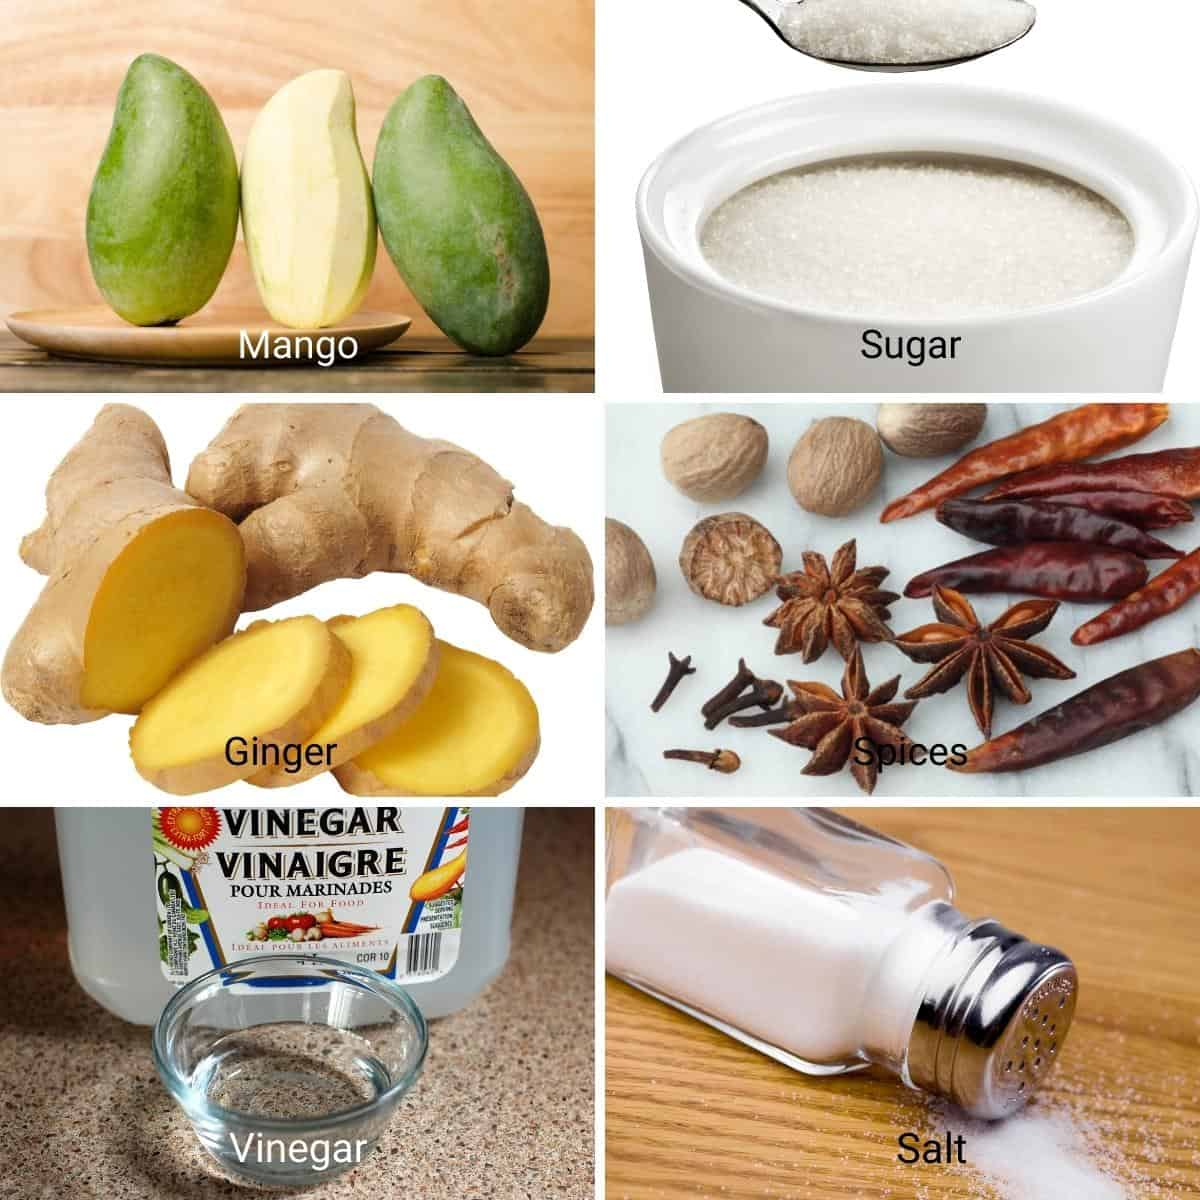 ingredients for a sweet mango chutney.